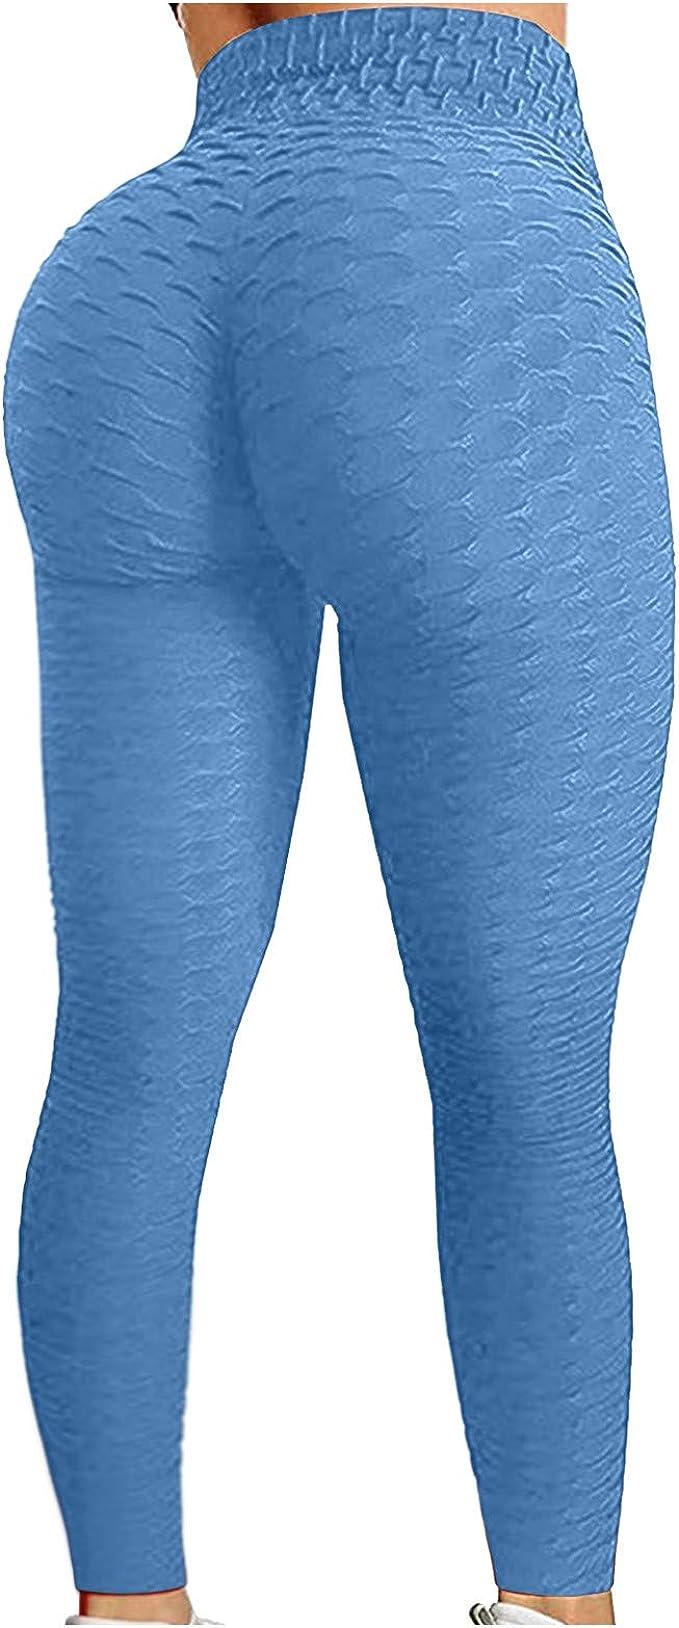 Zetiy Damen 5er-Set Strech Tights Sport Yoga Trainingsanzug XL, Rose Rot